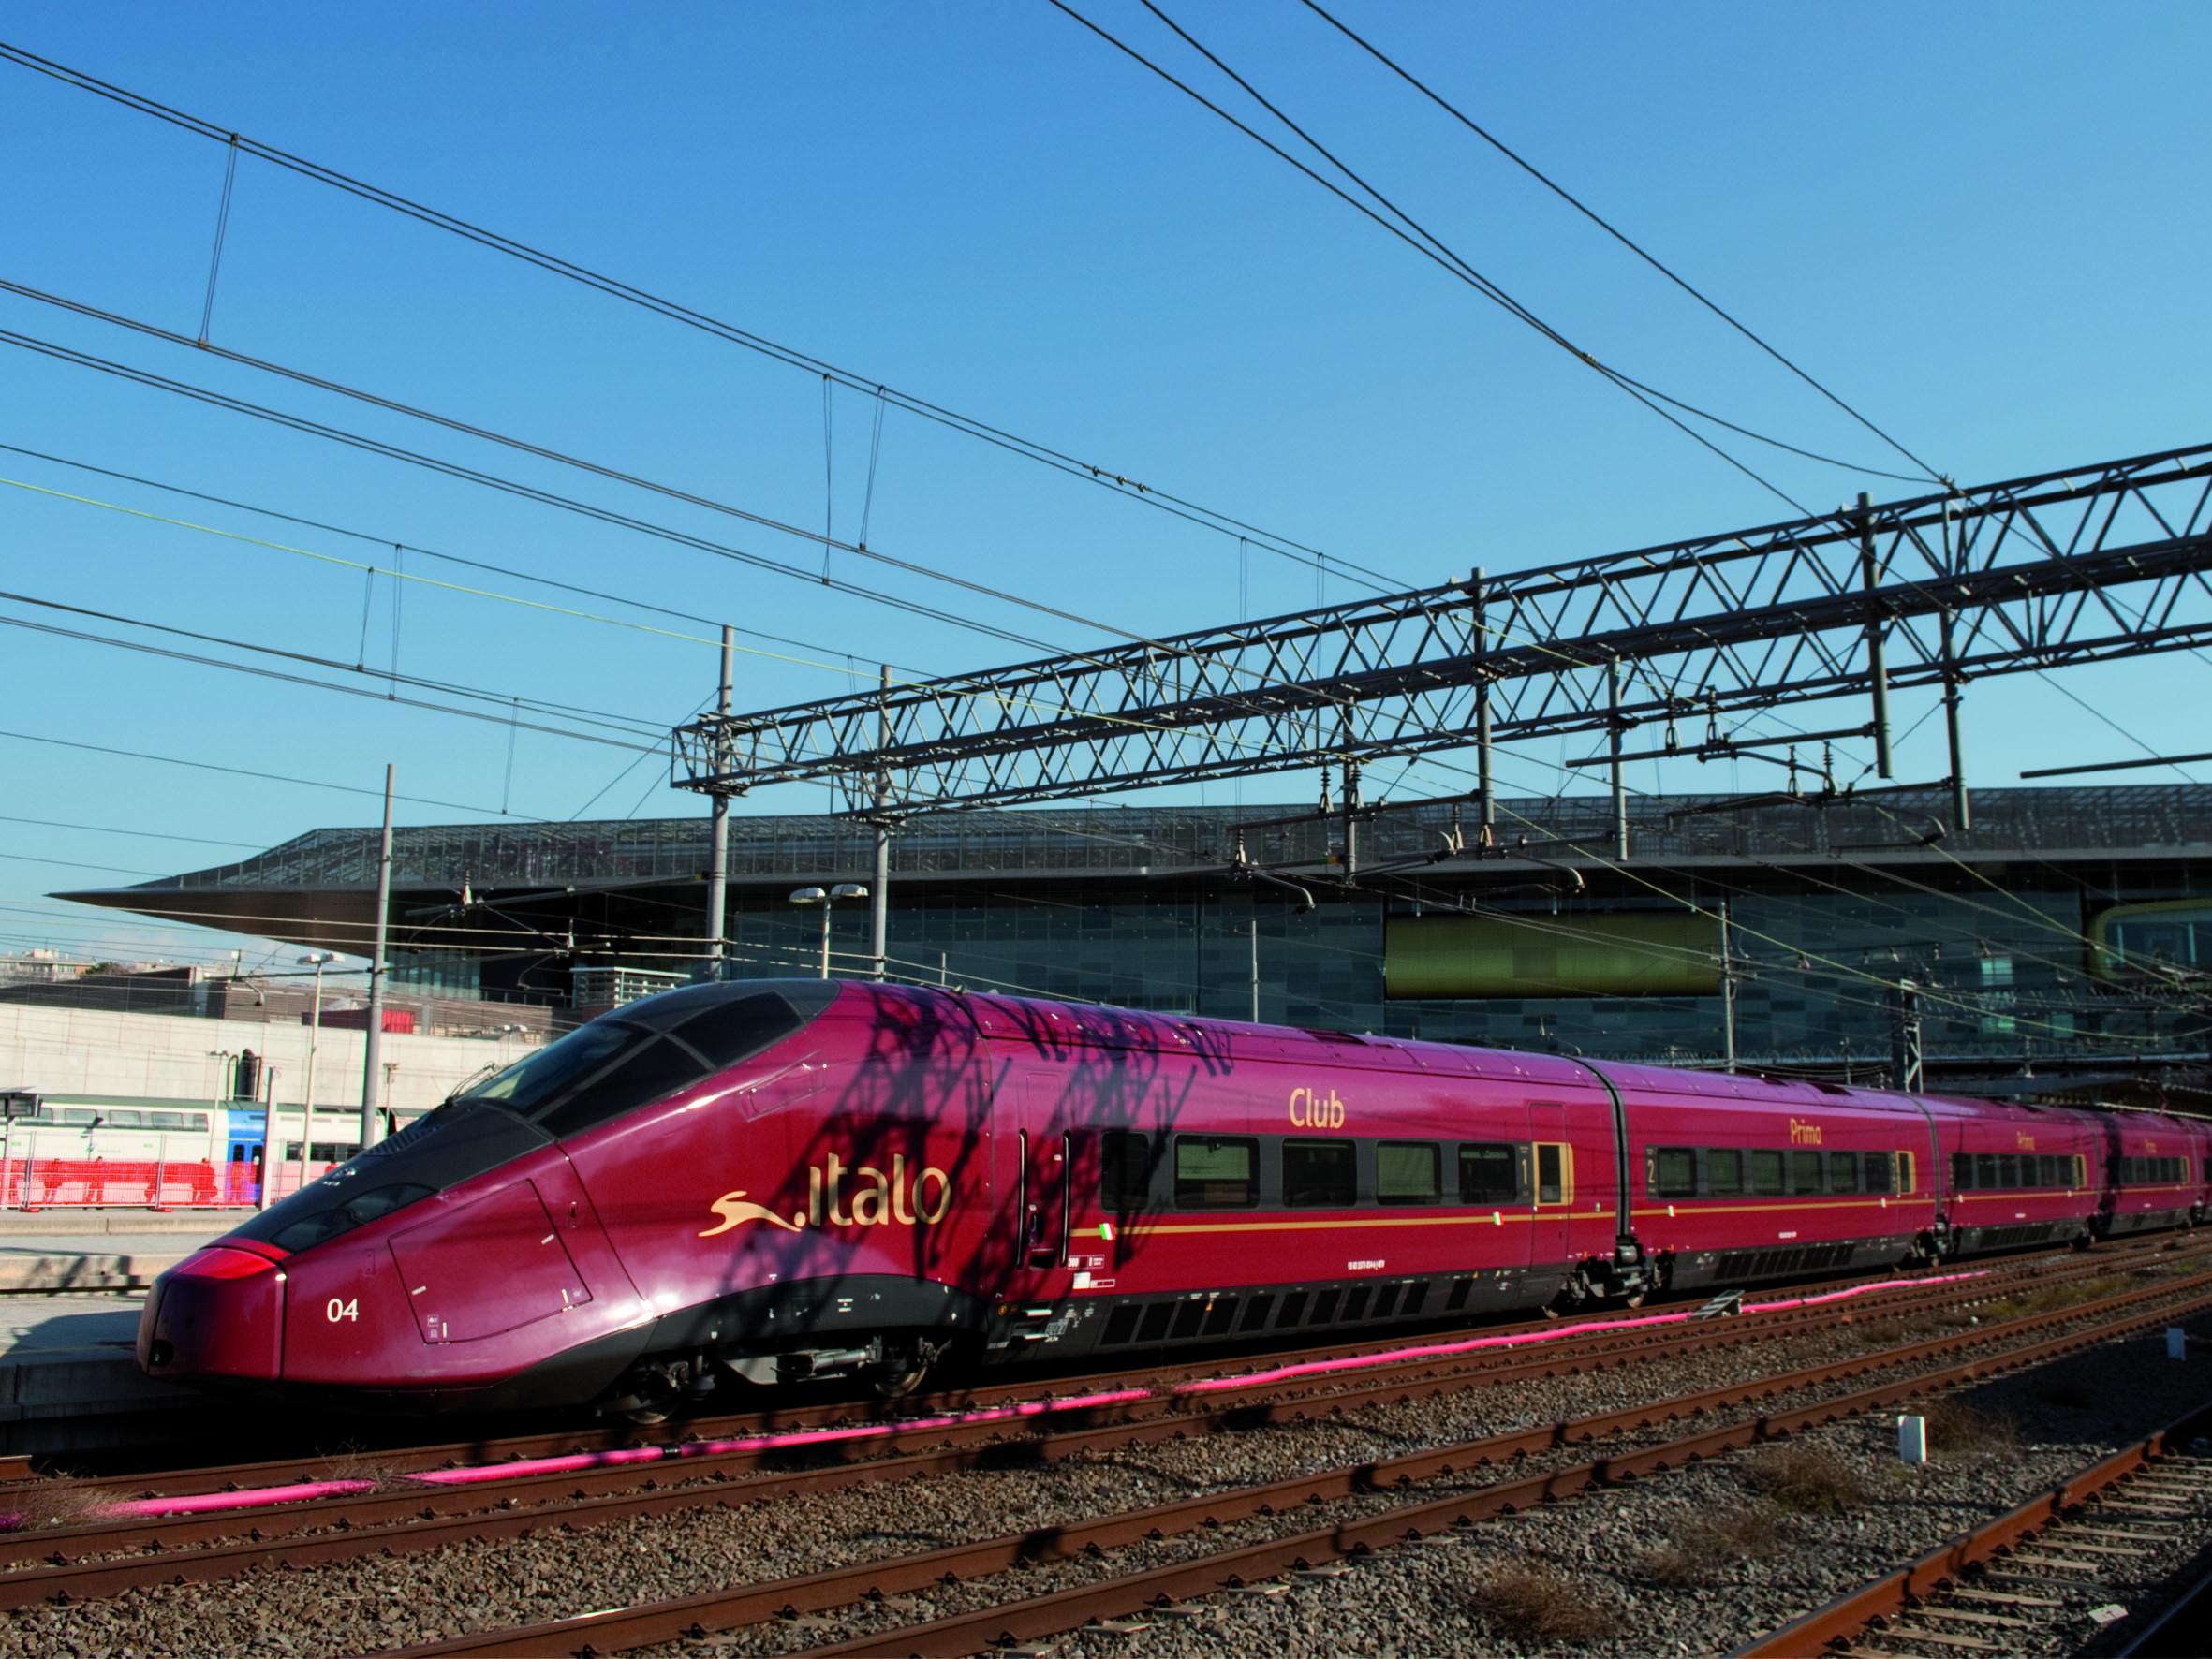 Finalmente parte italo treno gsa master news - Binario italo porta garibaldi ...